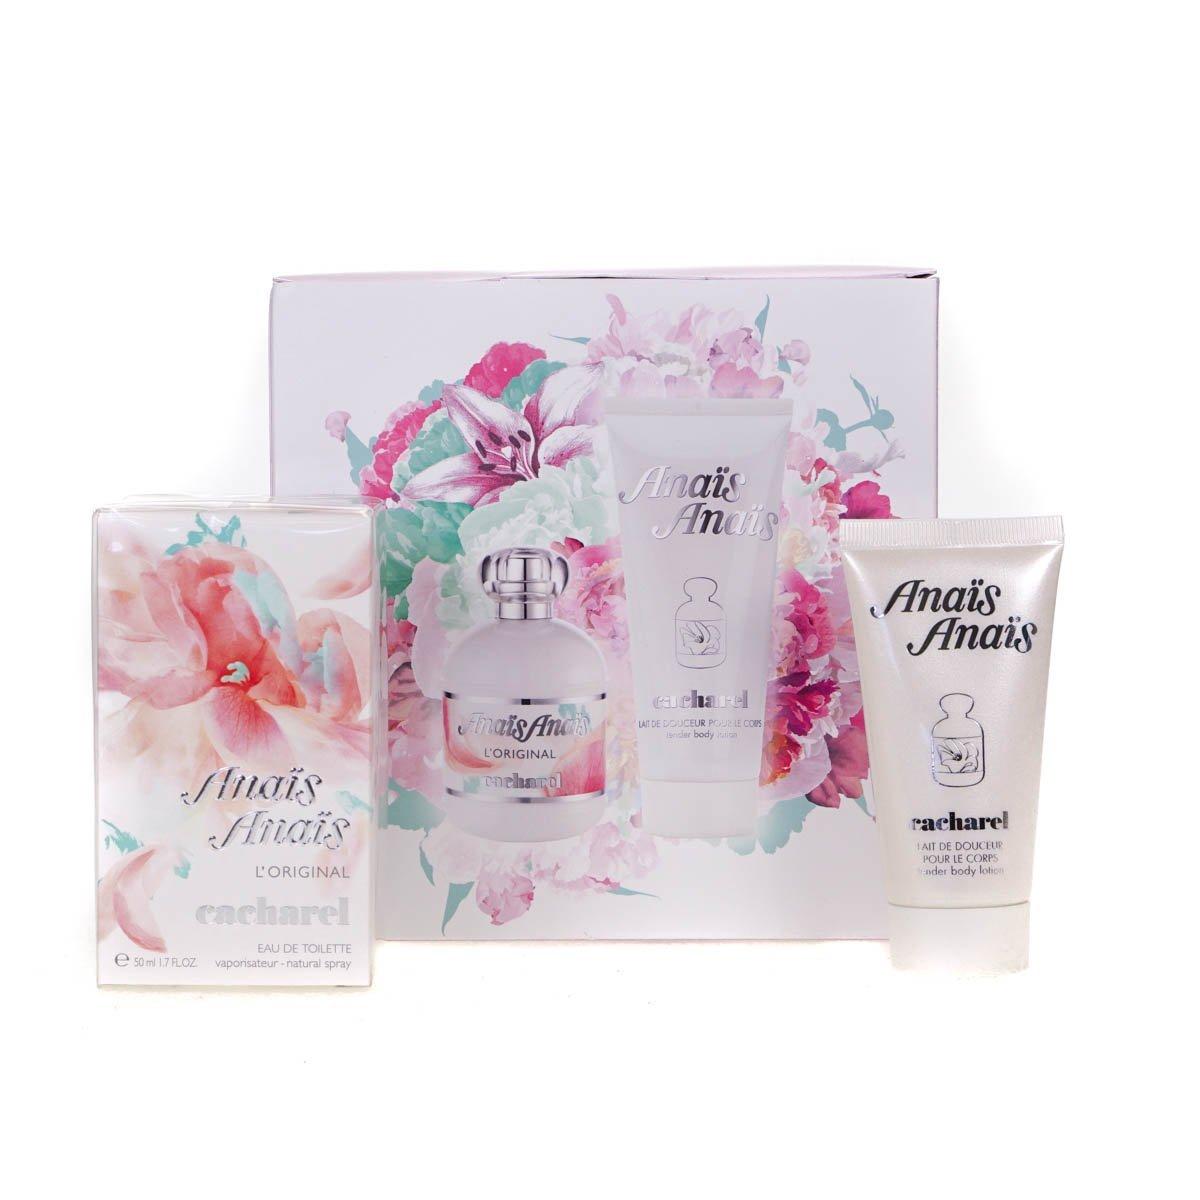 new product aef09 81fc4 Cacharel Anaïs Anaïs L'Original Gift Set 100ml EDT + 2 x 50ml Body Lotion